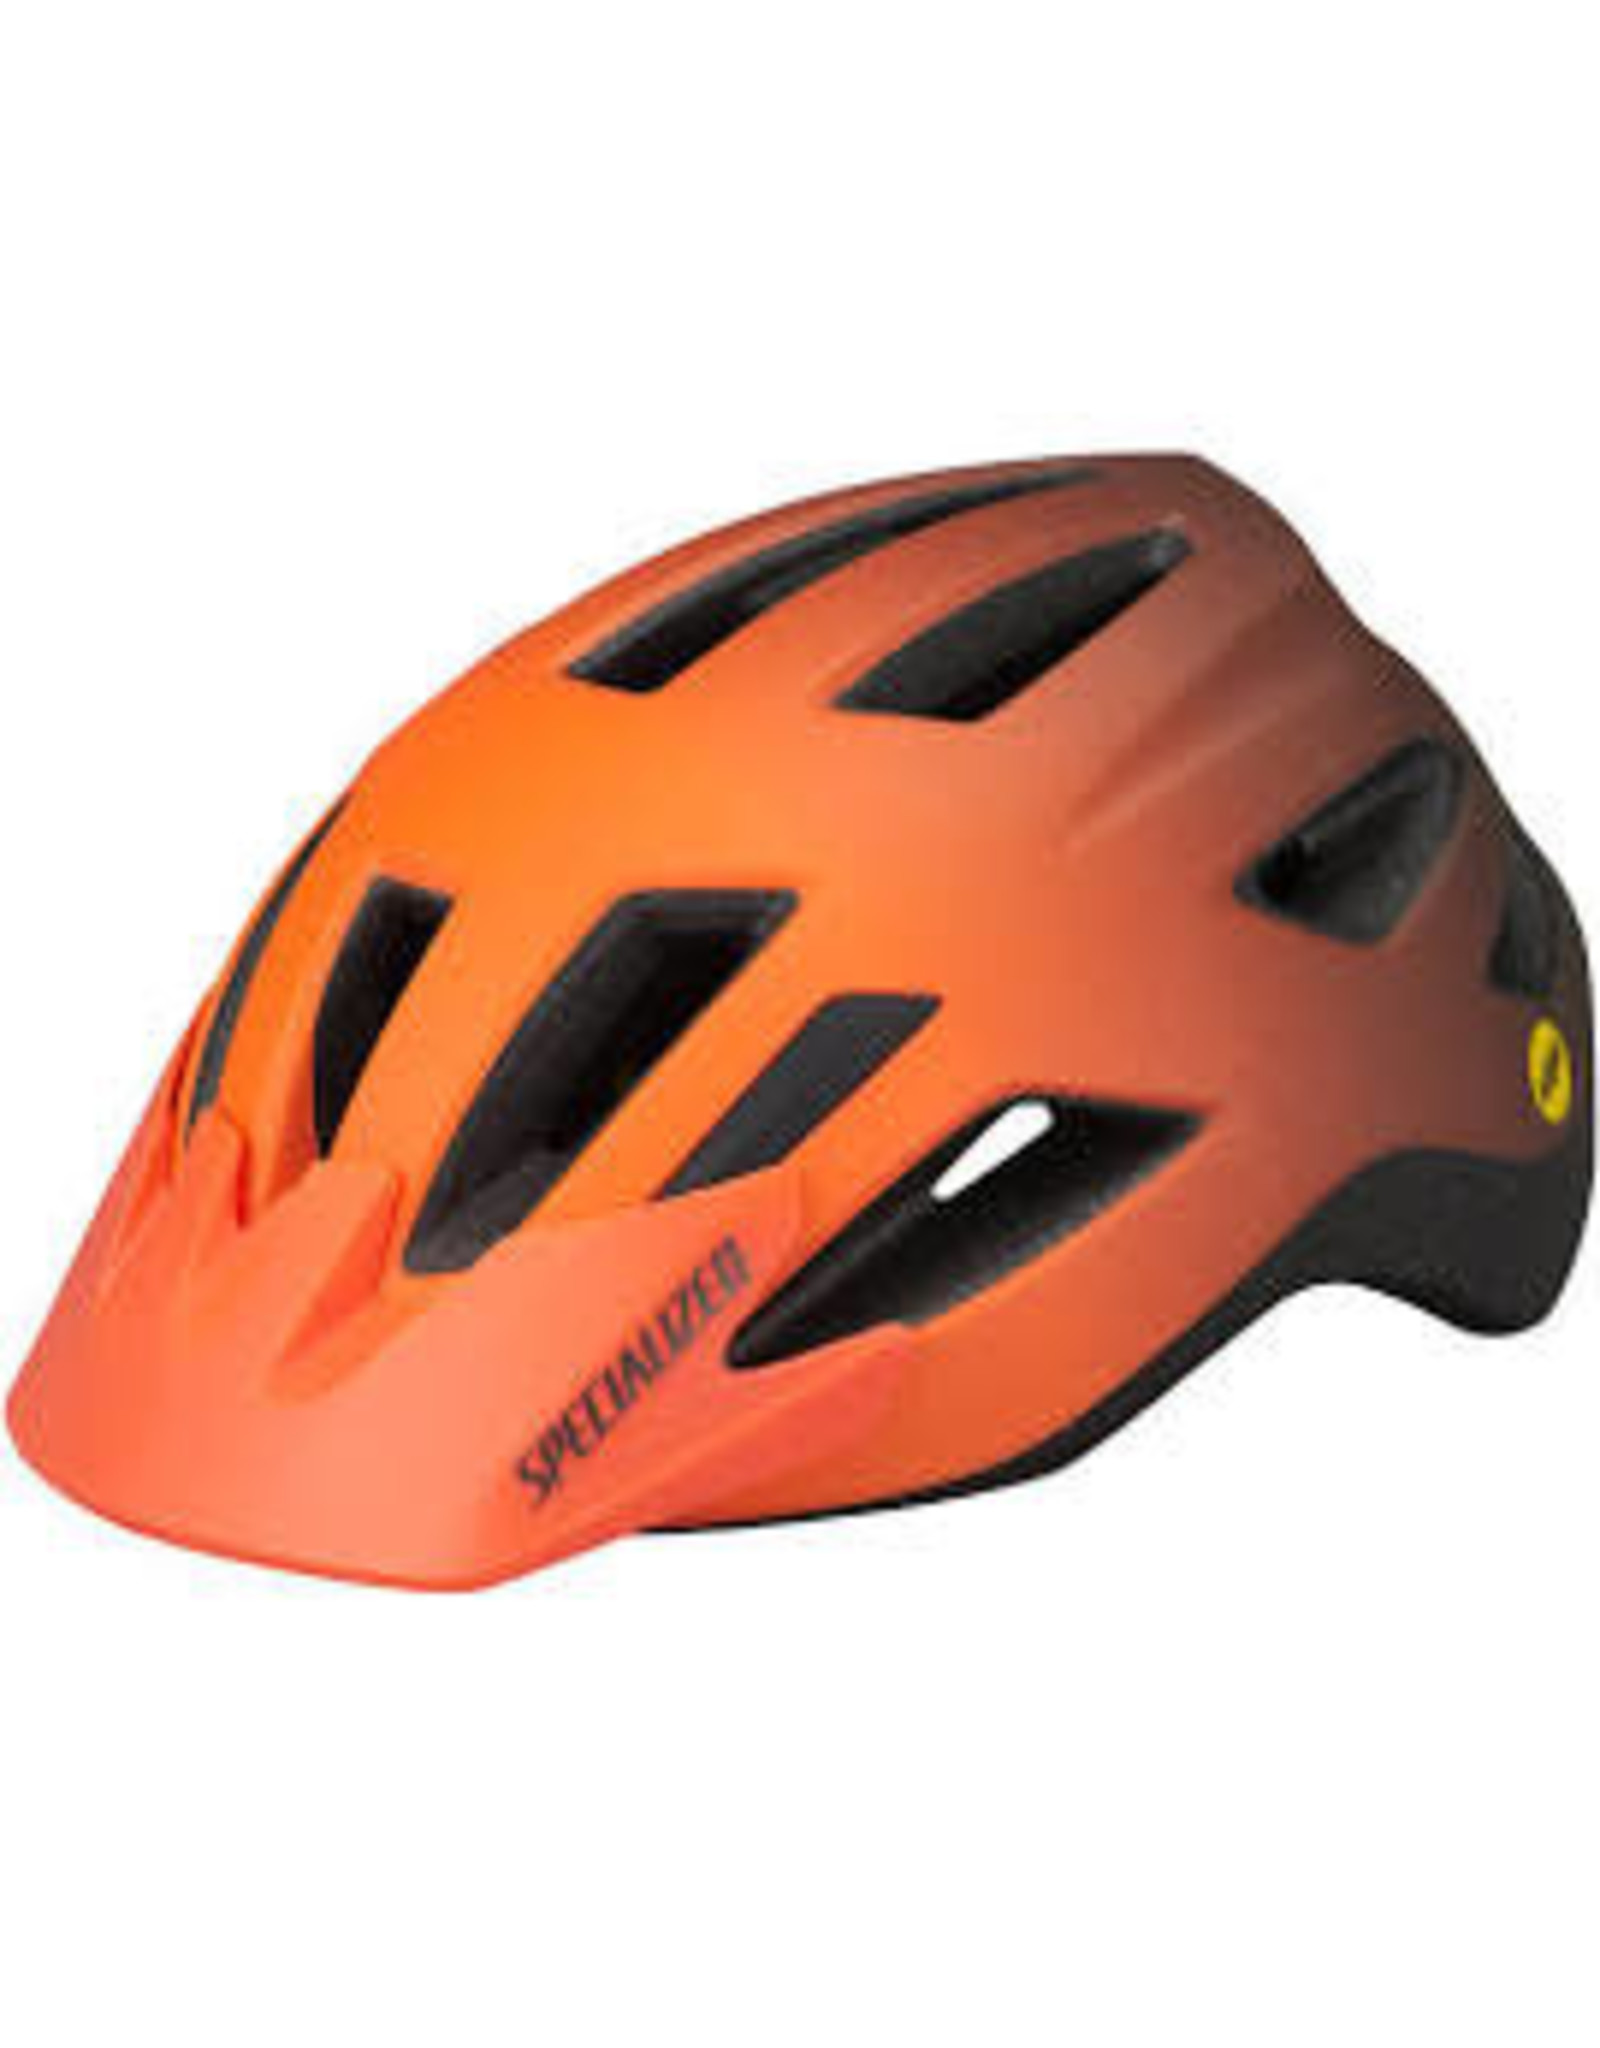 Specialized Helmet Spec Shuffle Blz/Smoke